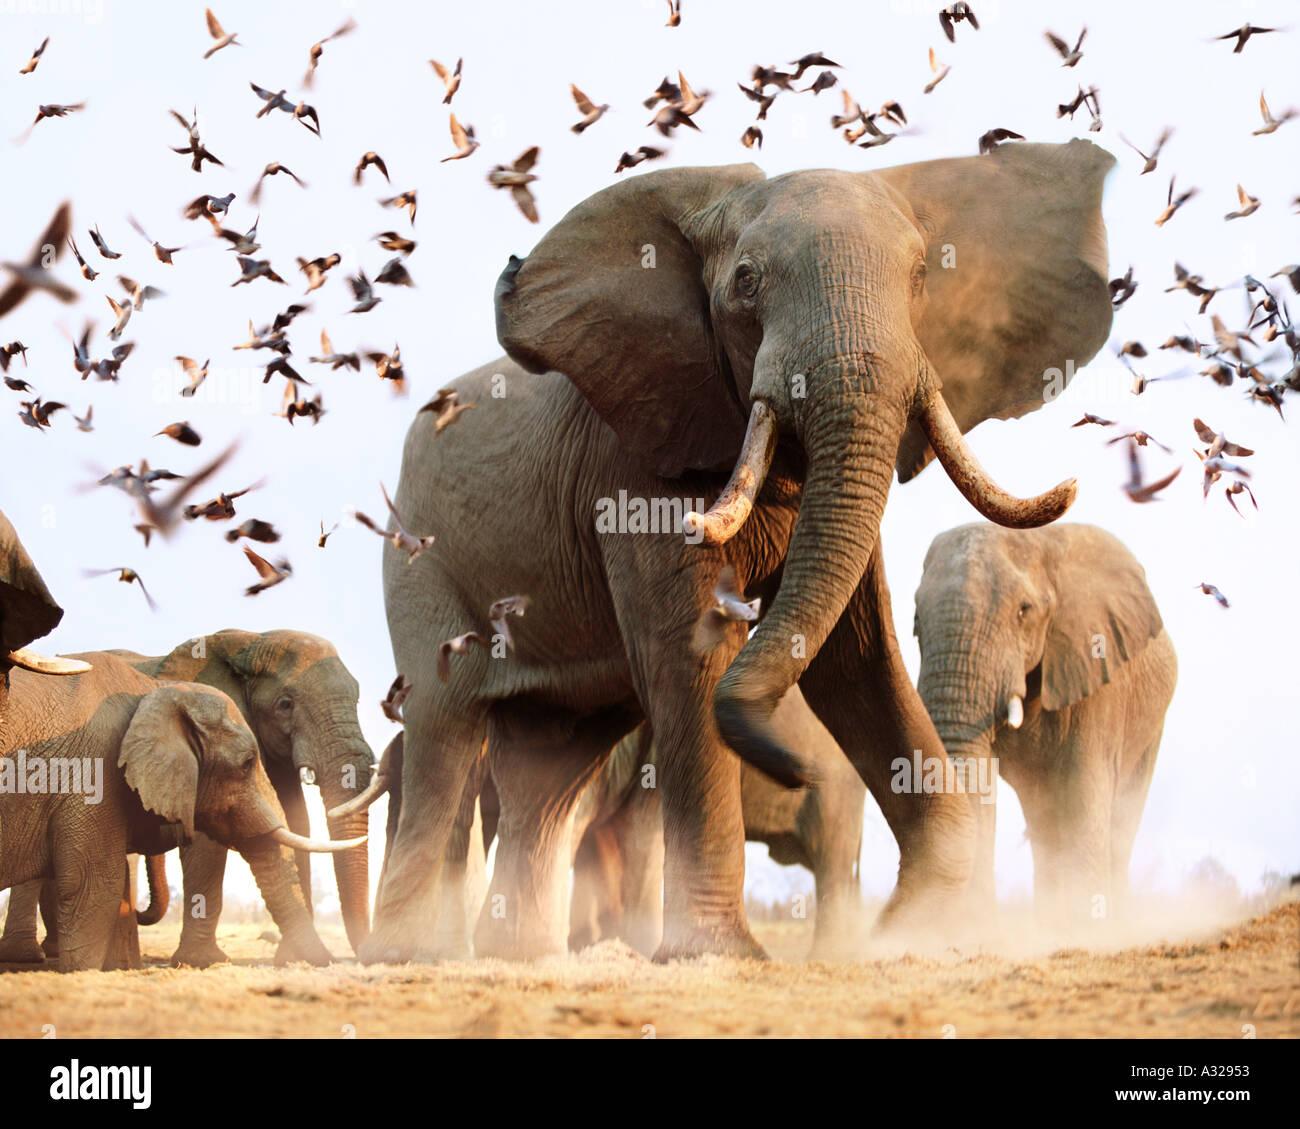 African elephants disturbing flock of birds Savuti Botswana Stock Foto